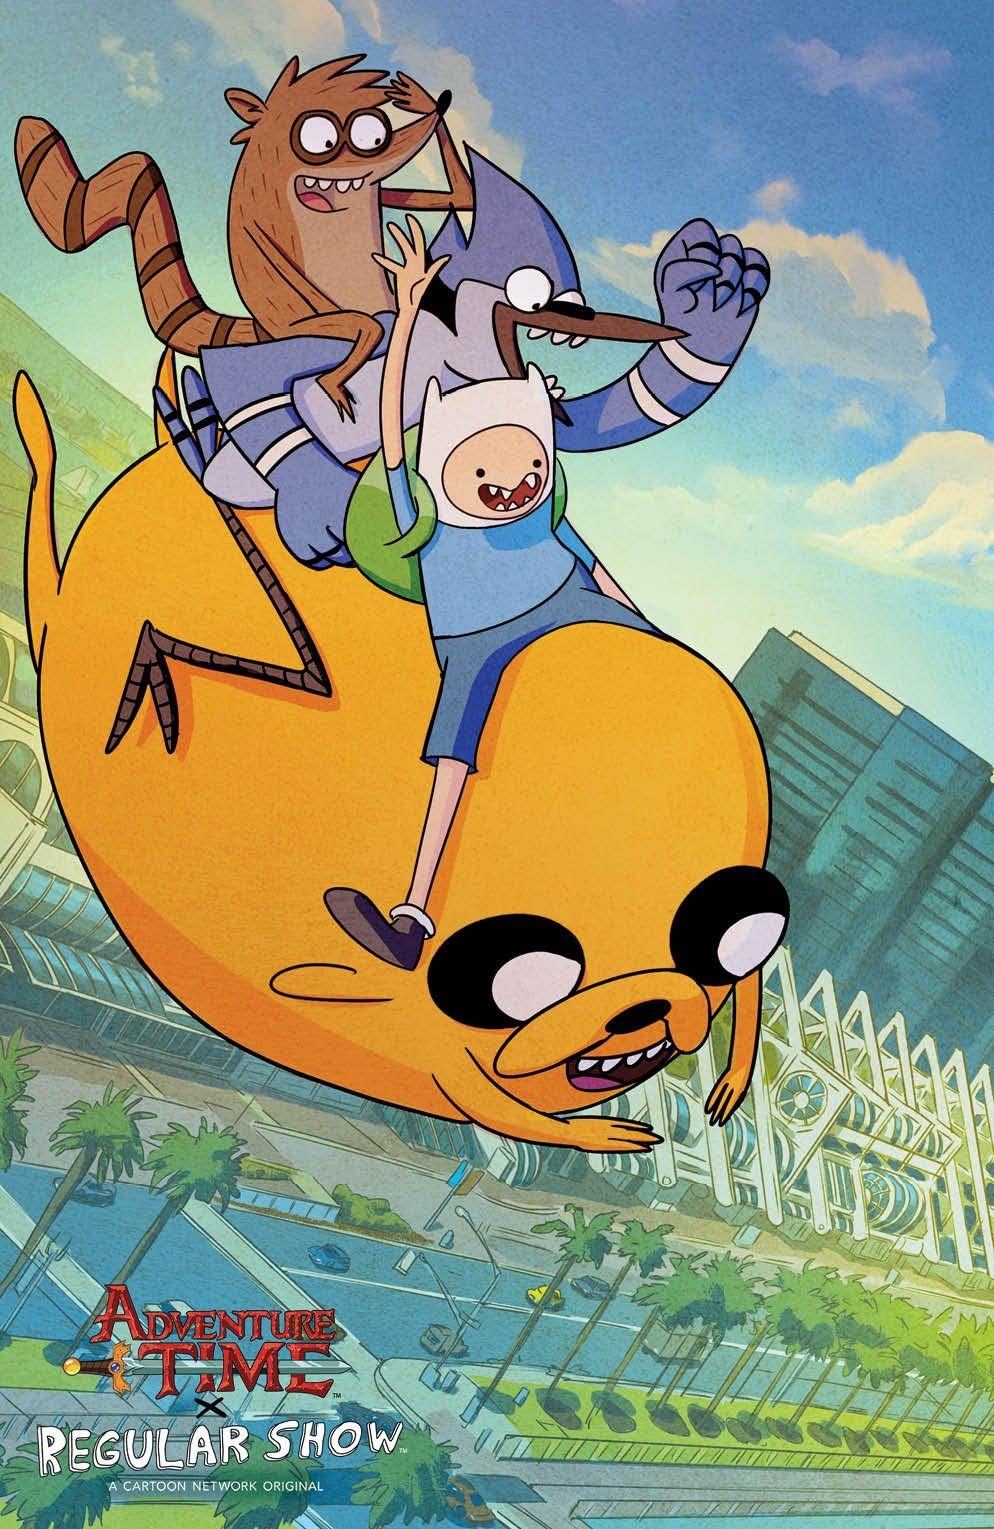 Regular Show & Adventure Time Let's Go!, 2019 Macera